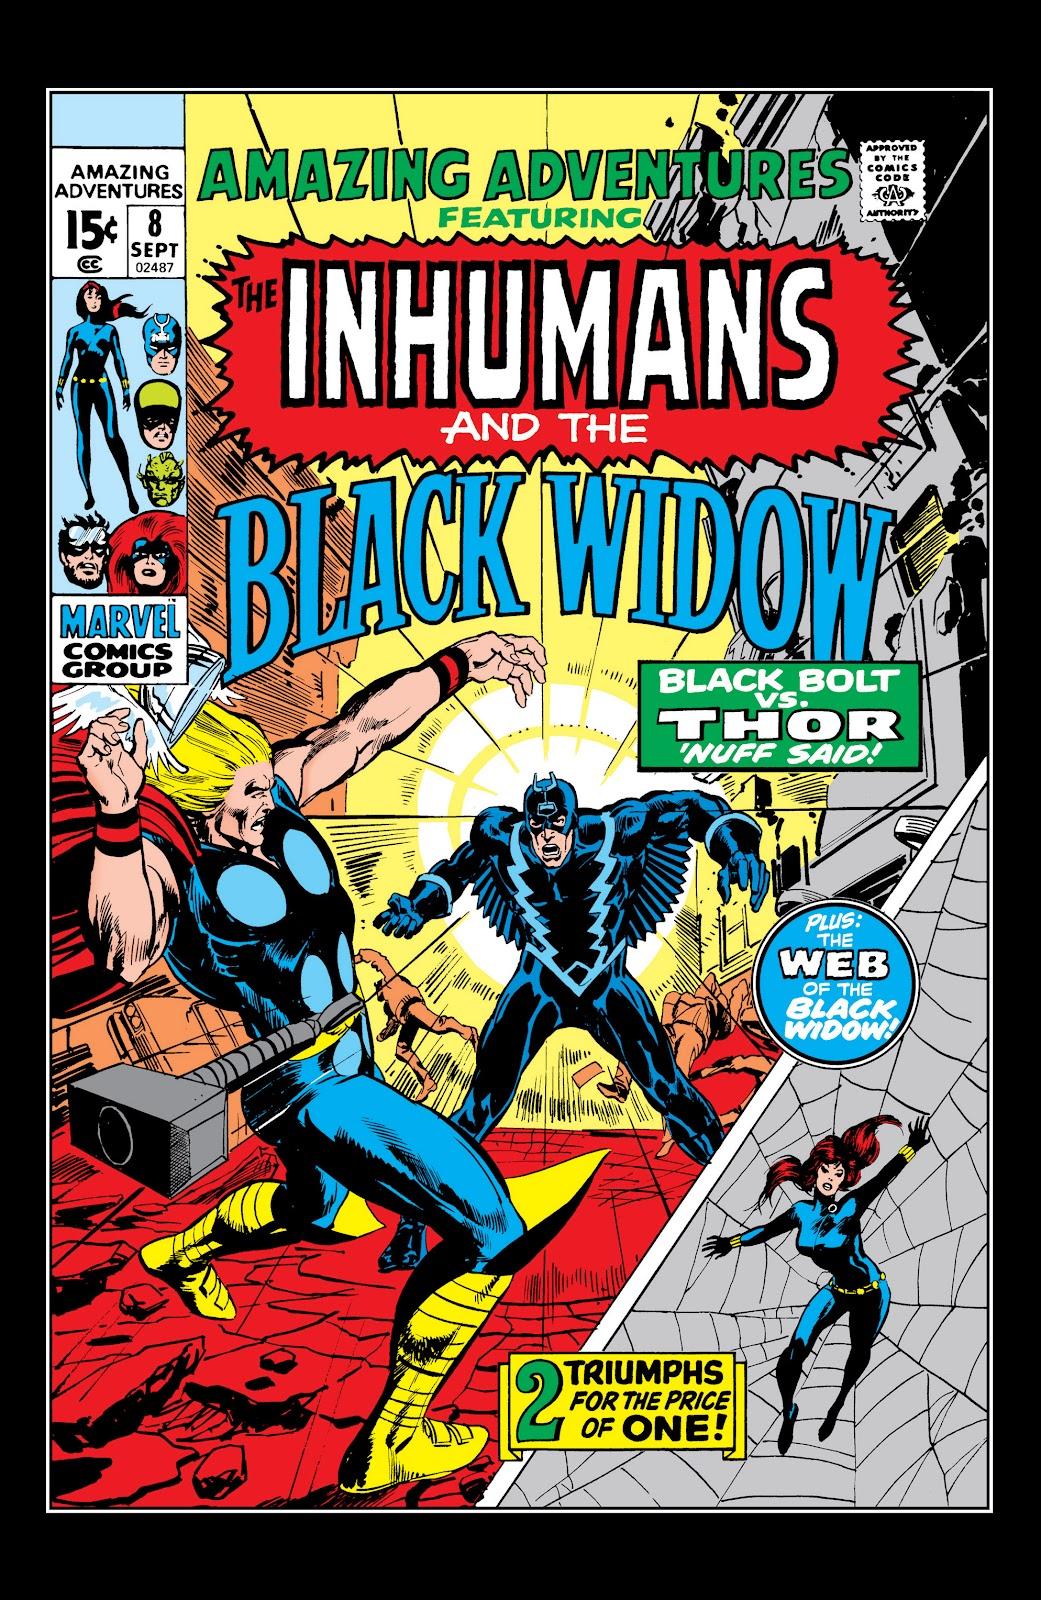 Read online Marvel Masterworks: The Inhumans comic -  Issue # TPB 1 (Part 2) - 46